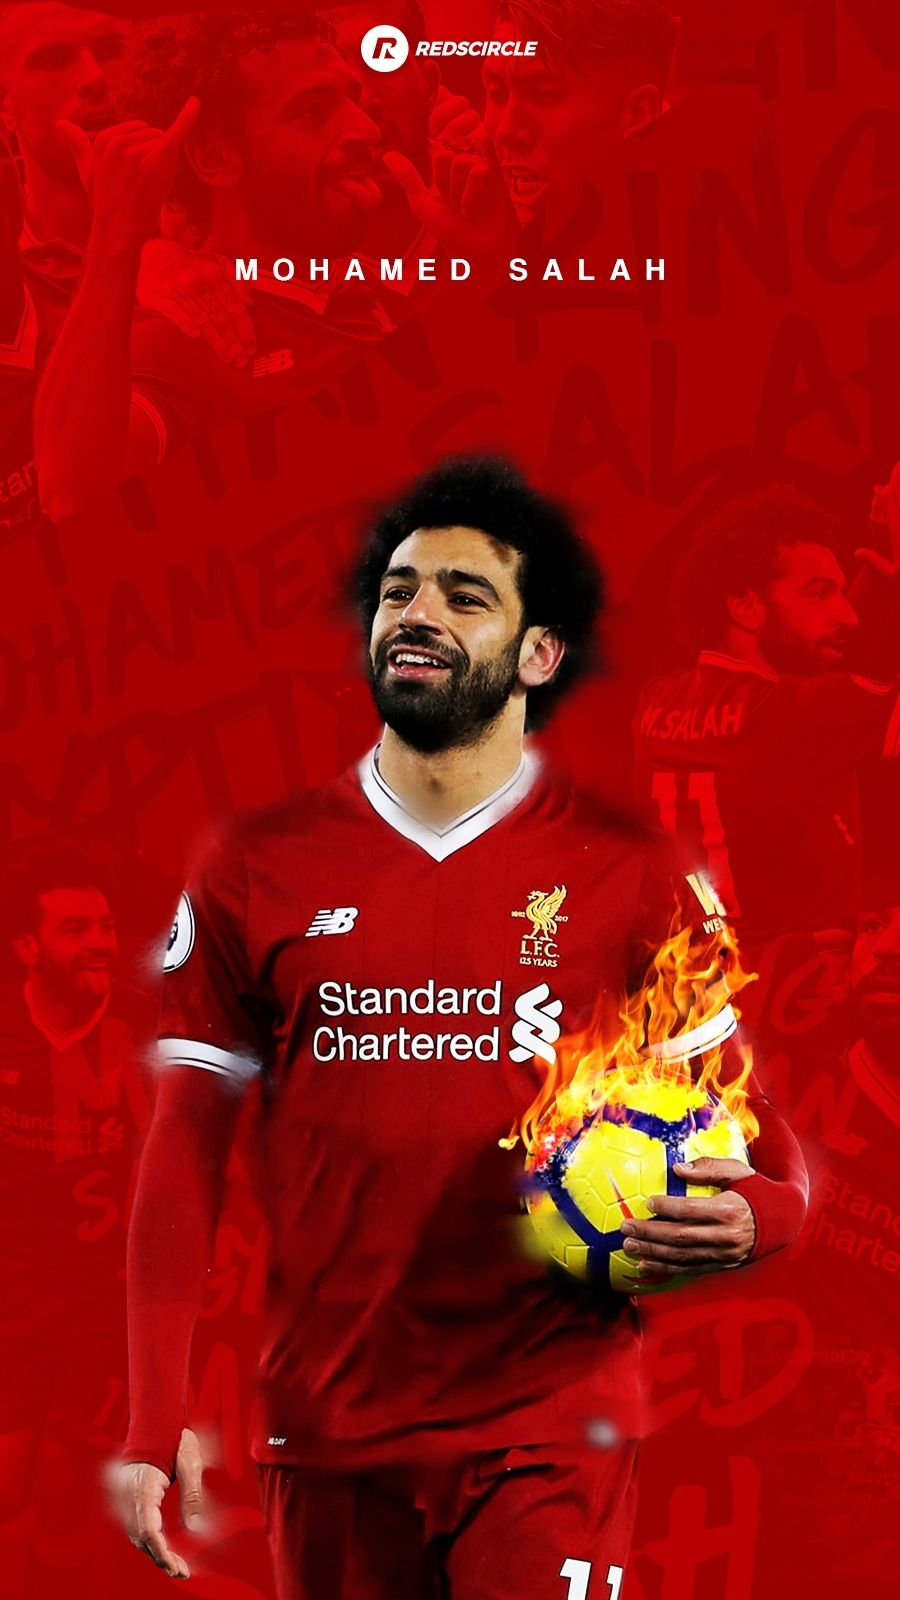 Wallpaper Mohamed Salah Mohamed Salah Liverpool Salah